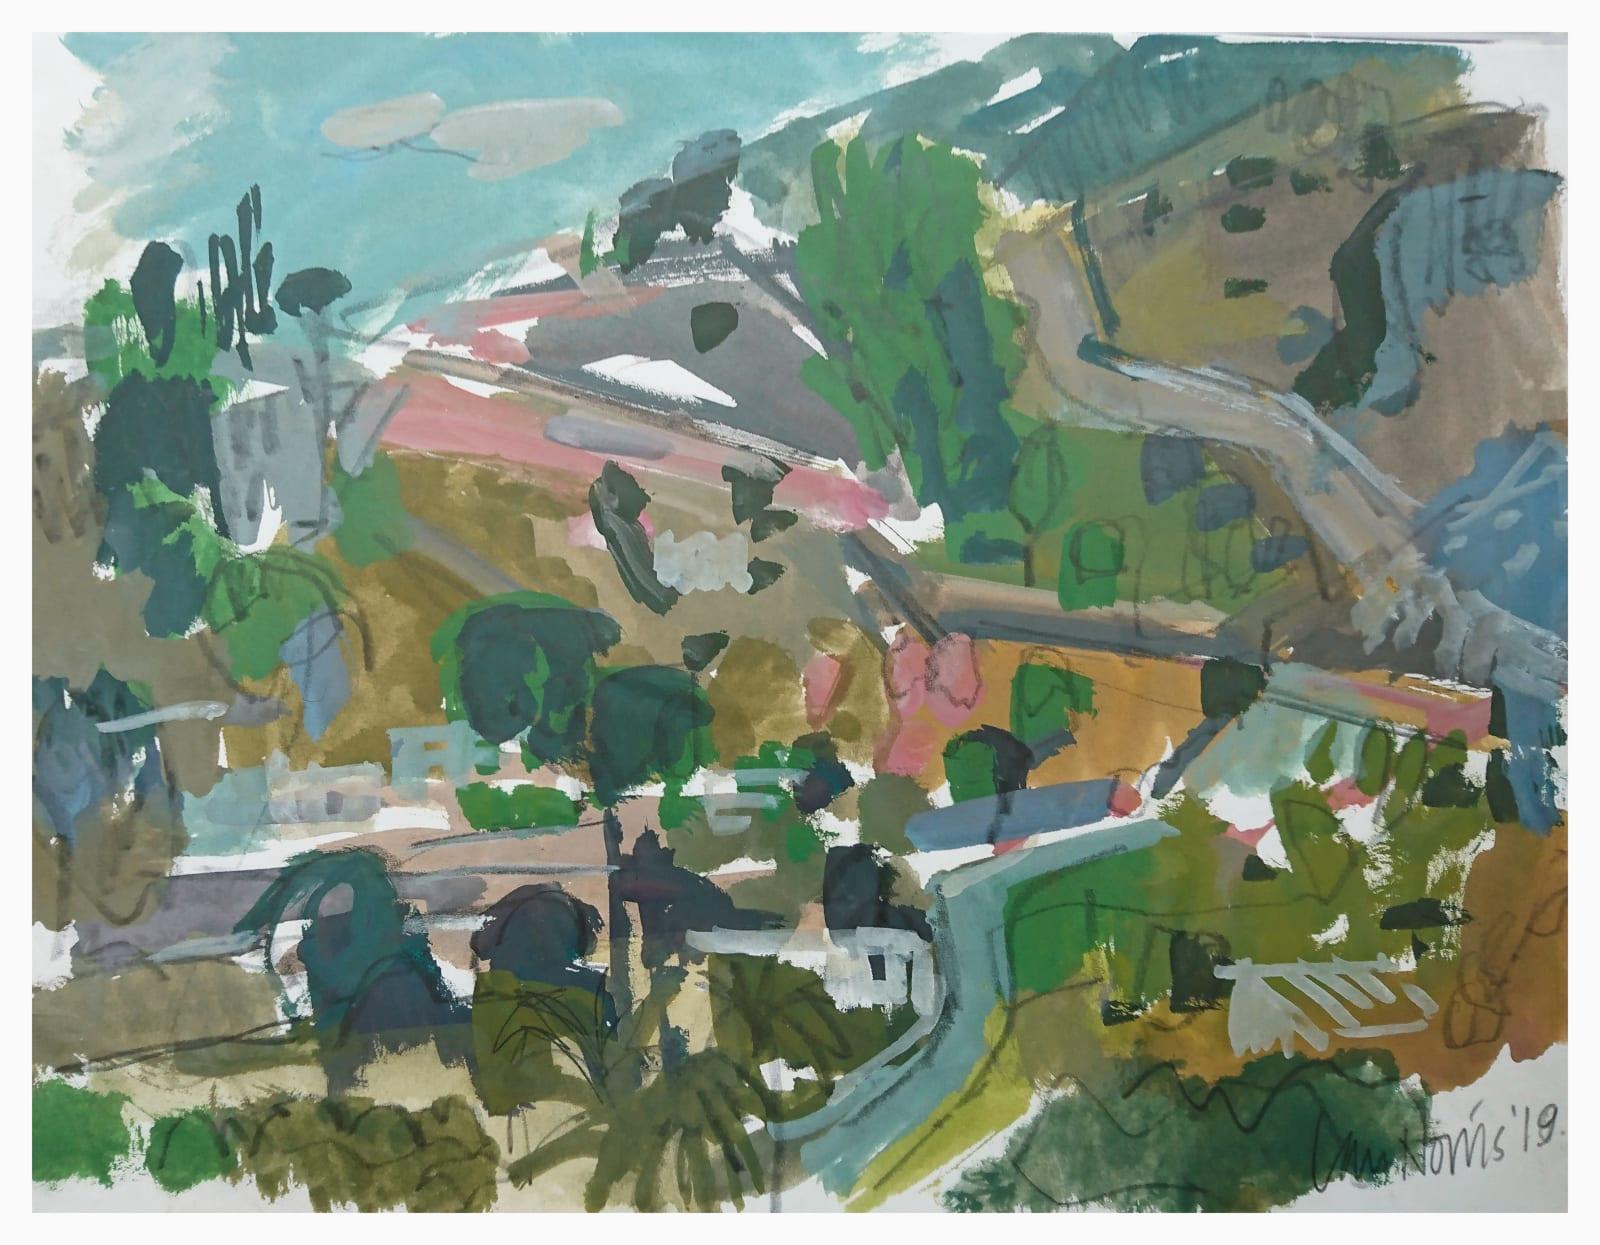 Ian Norris MAFA, Mountain Road